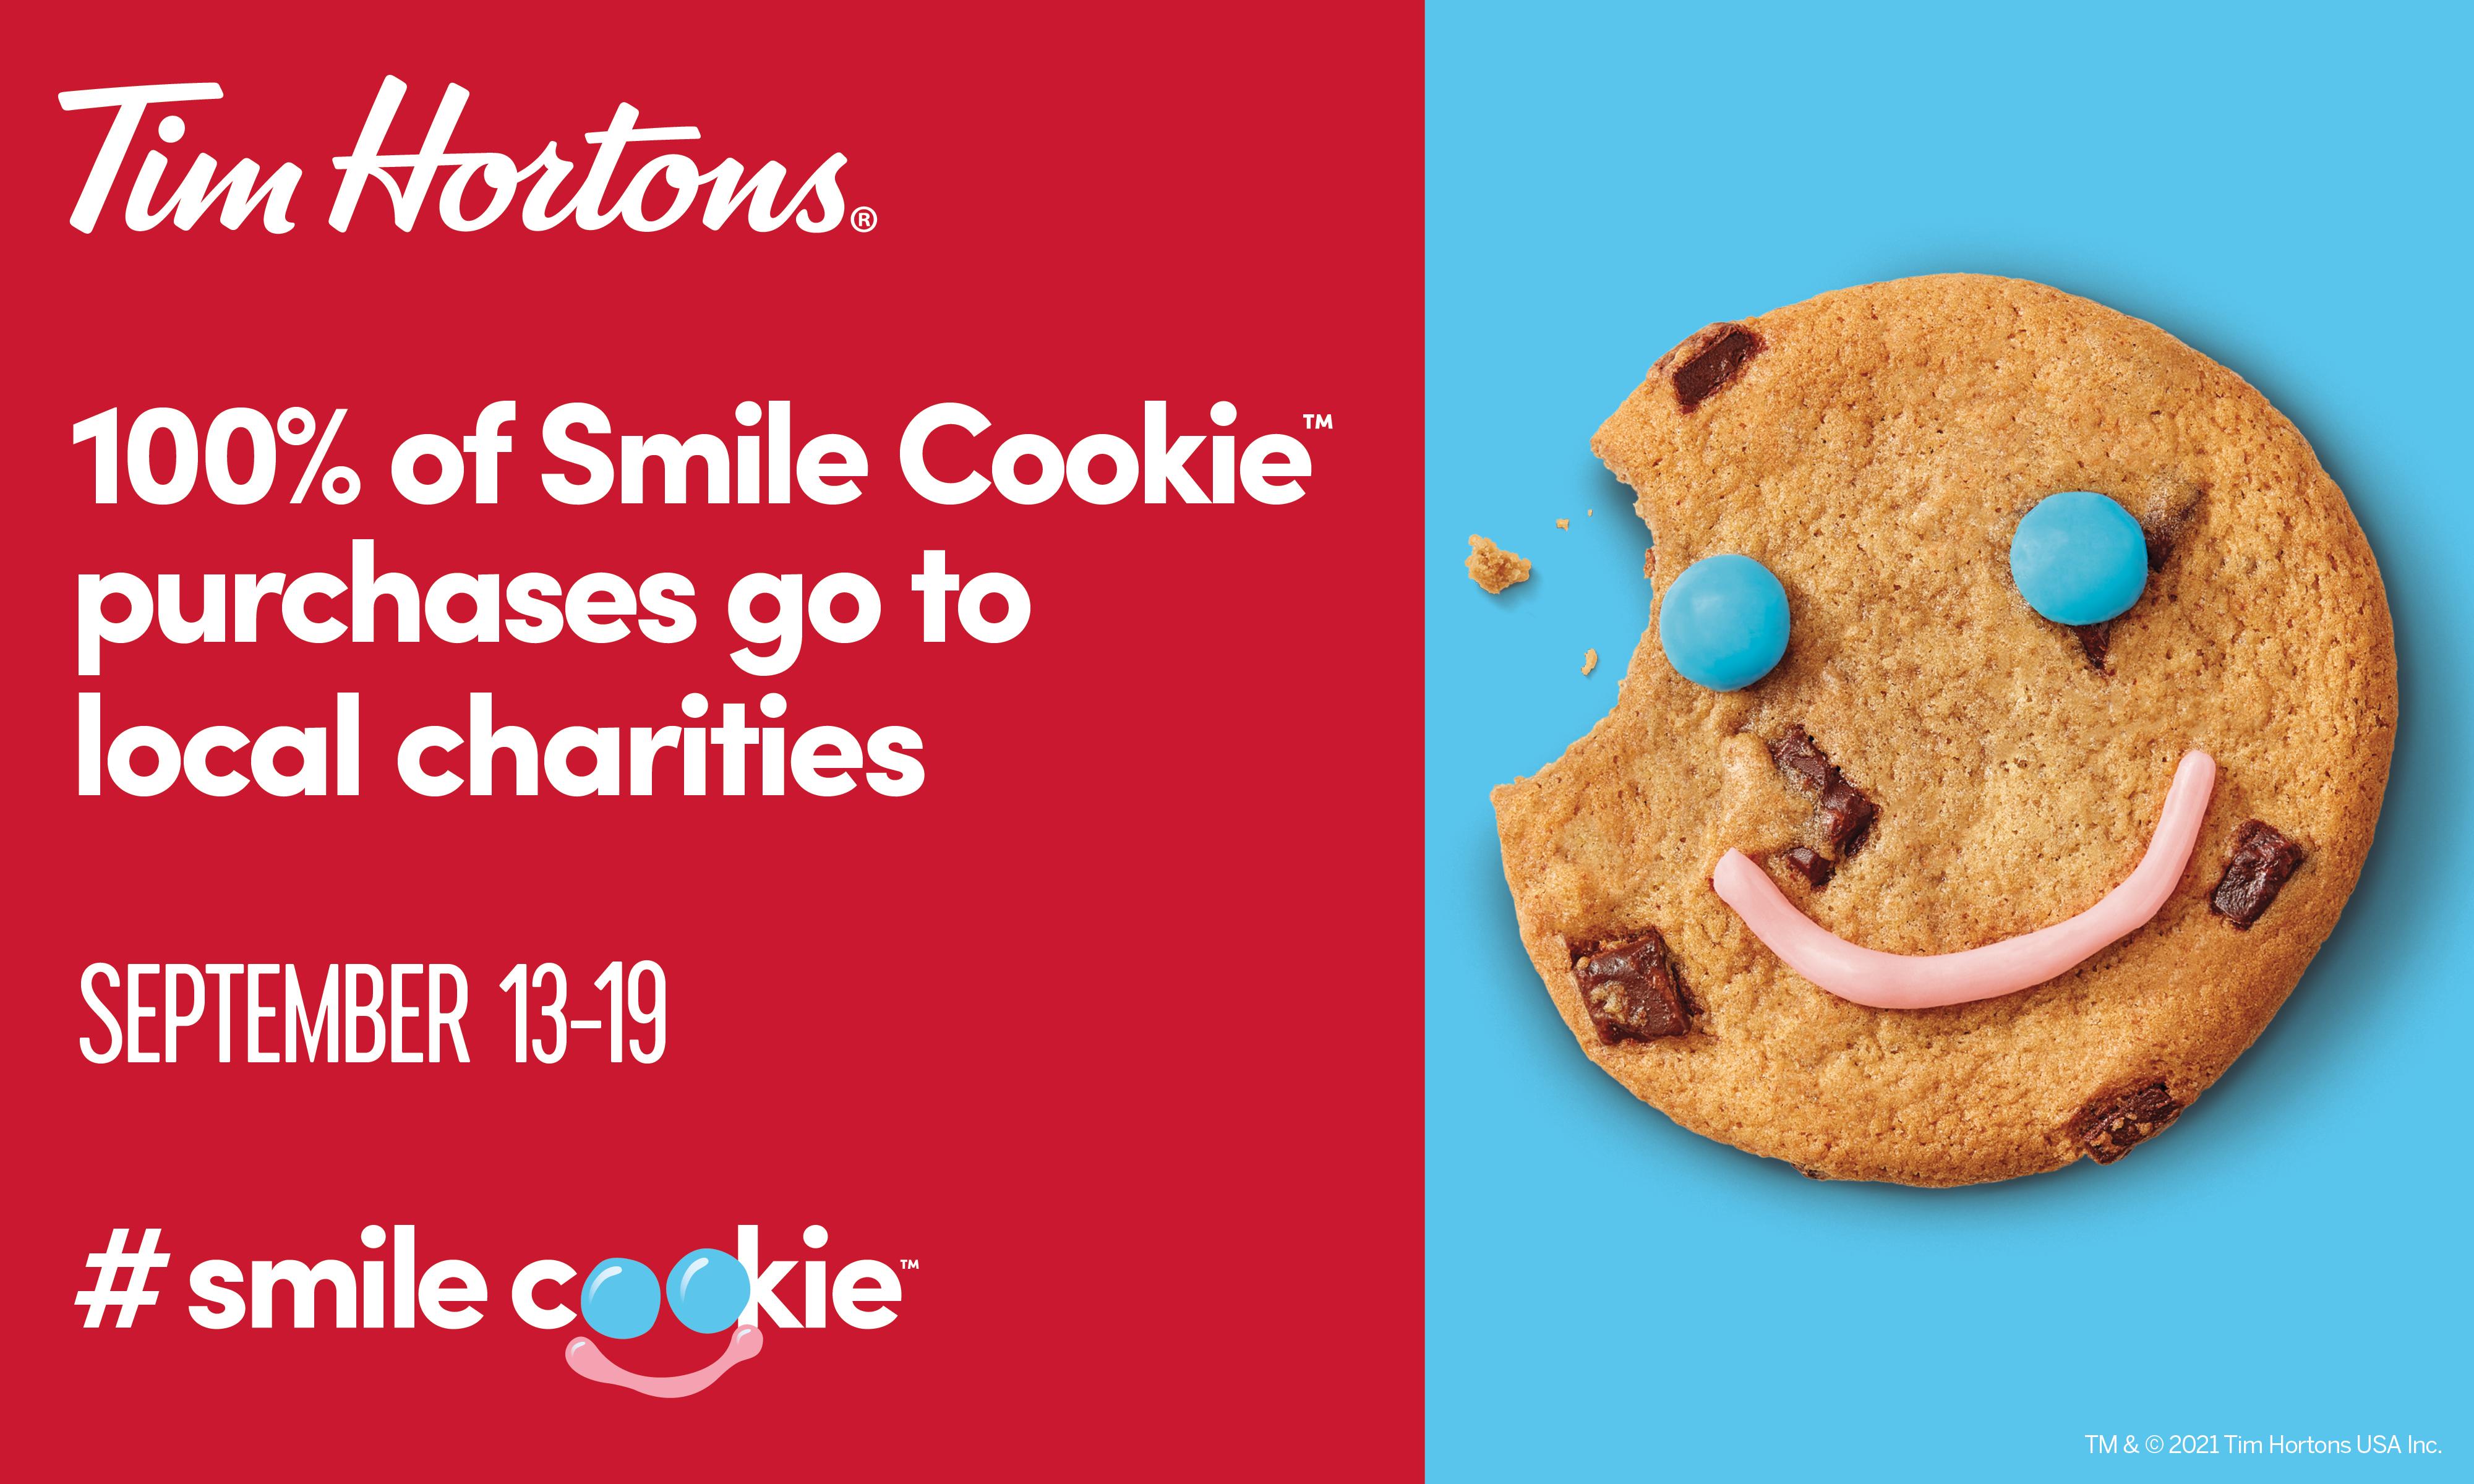 Tim Hortons Smile Cookie